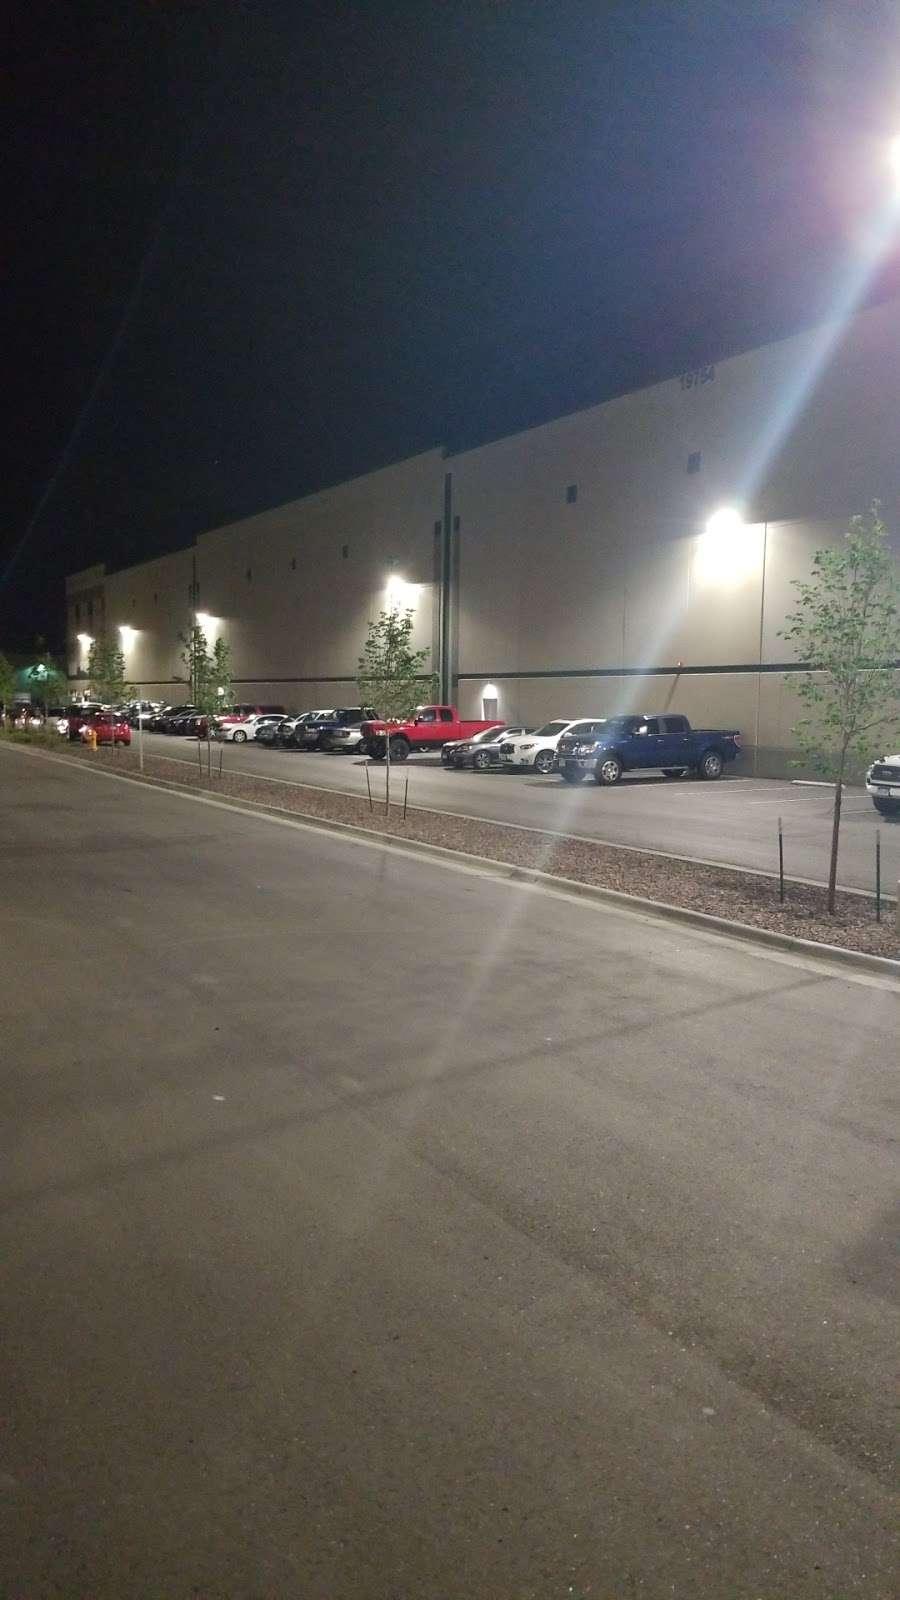 QCD Rocky Mountain LLC - storage  | Photo 10 of 10 | Address: 19754 E 35th Dr, Aurora, CO 80011, USA | Phone: (303) 552-3615